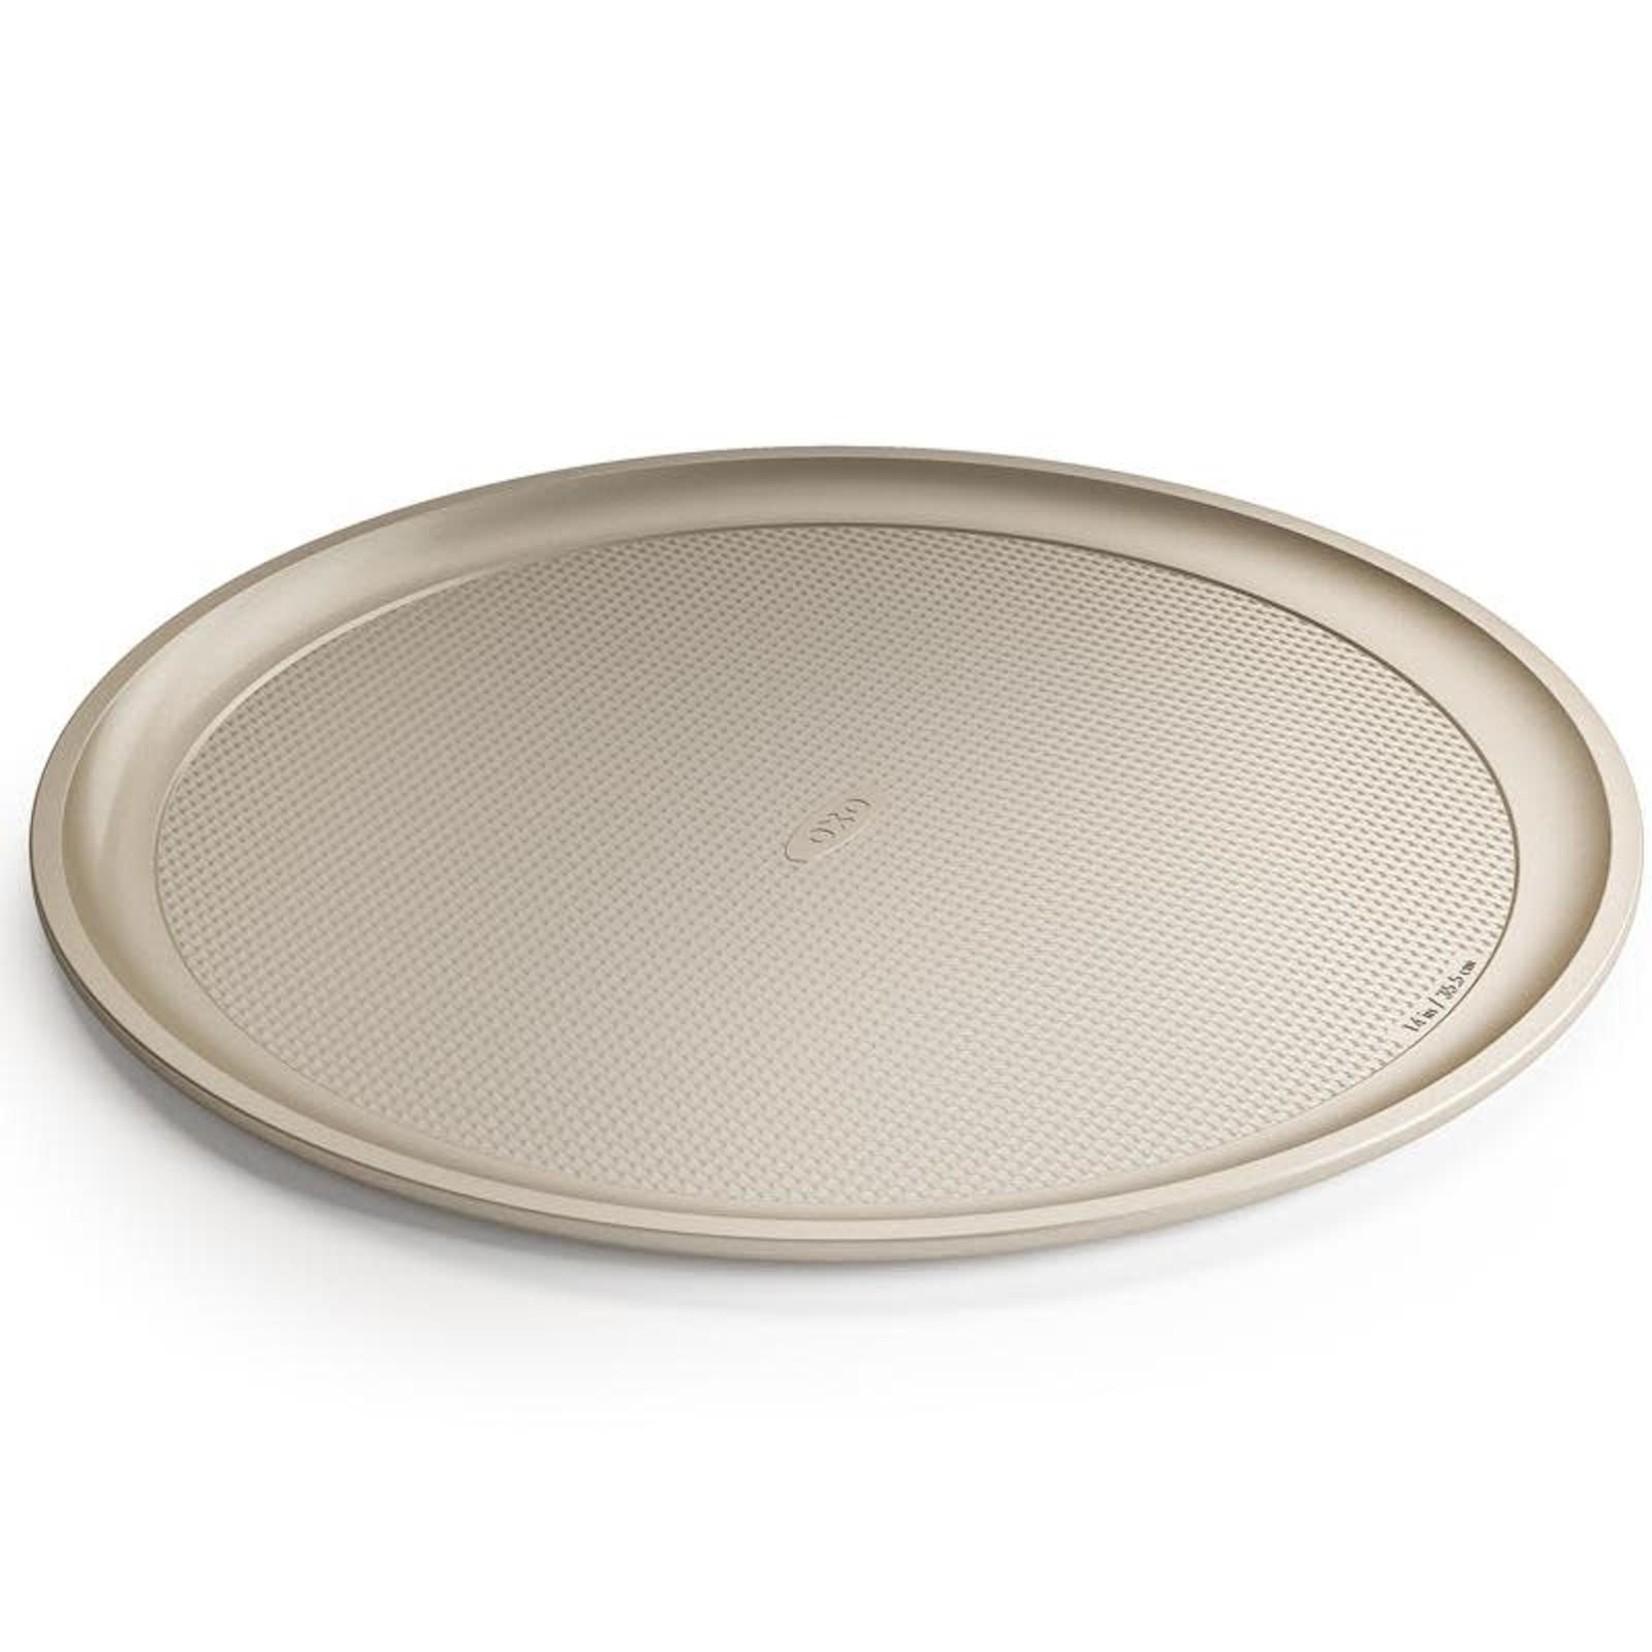 OXO Non Stick Pro Pizza Pan